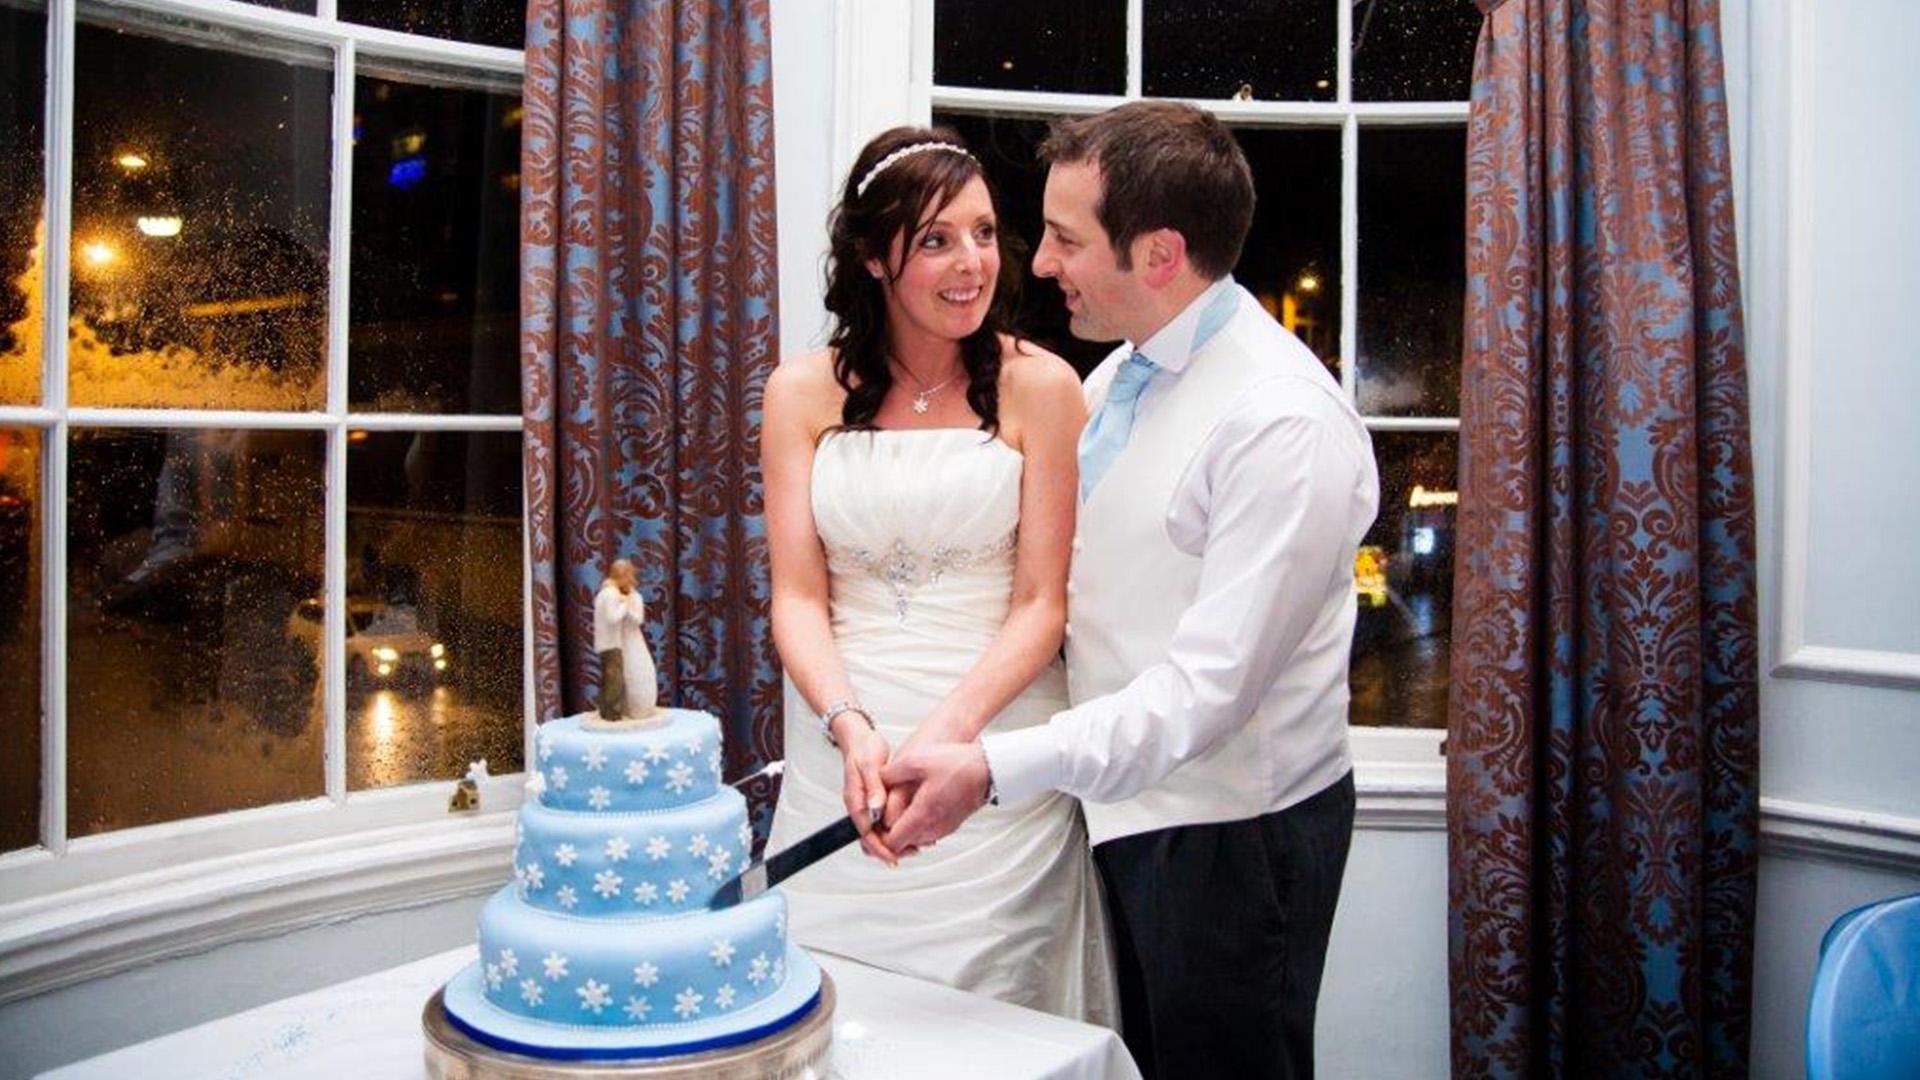 Wedding Venues in Hampshire Mercure Southampton Centre Dolphin Hotel winter wedding venues 8